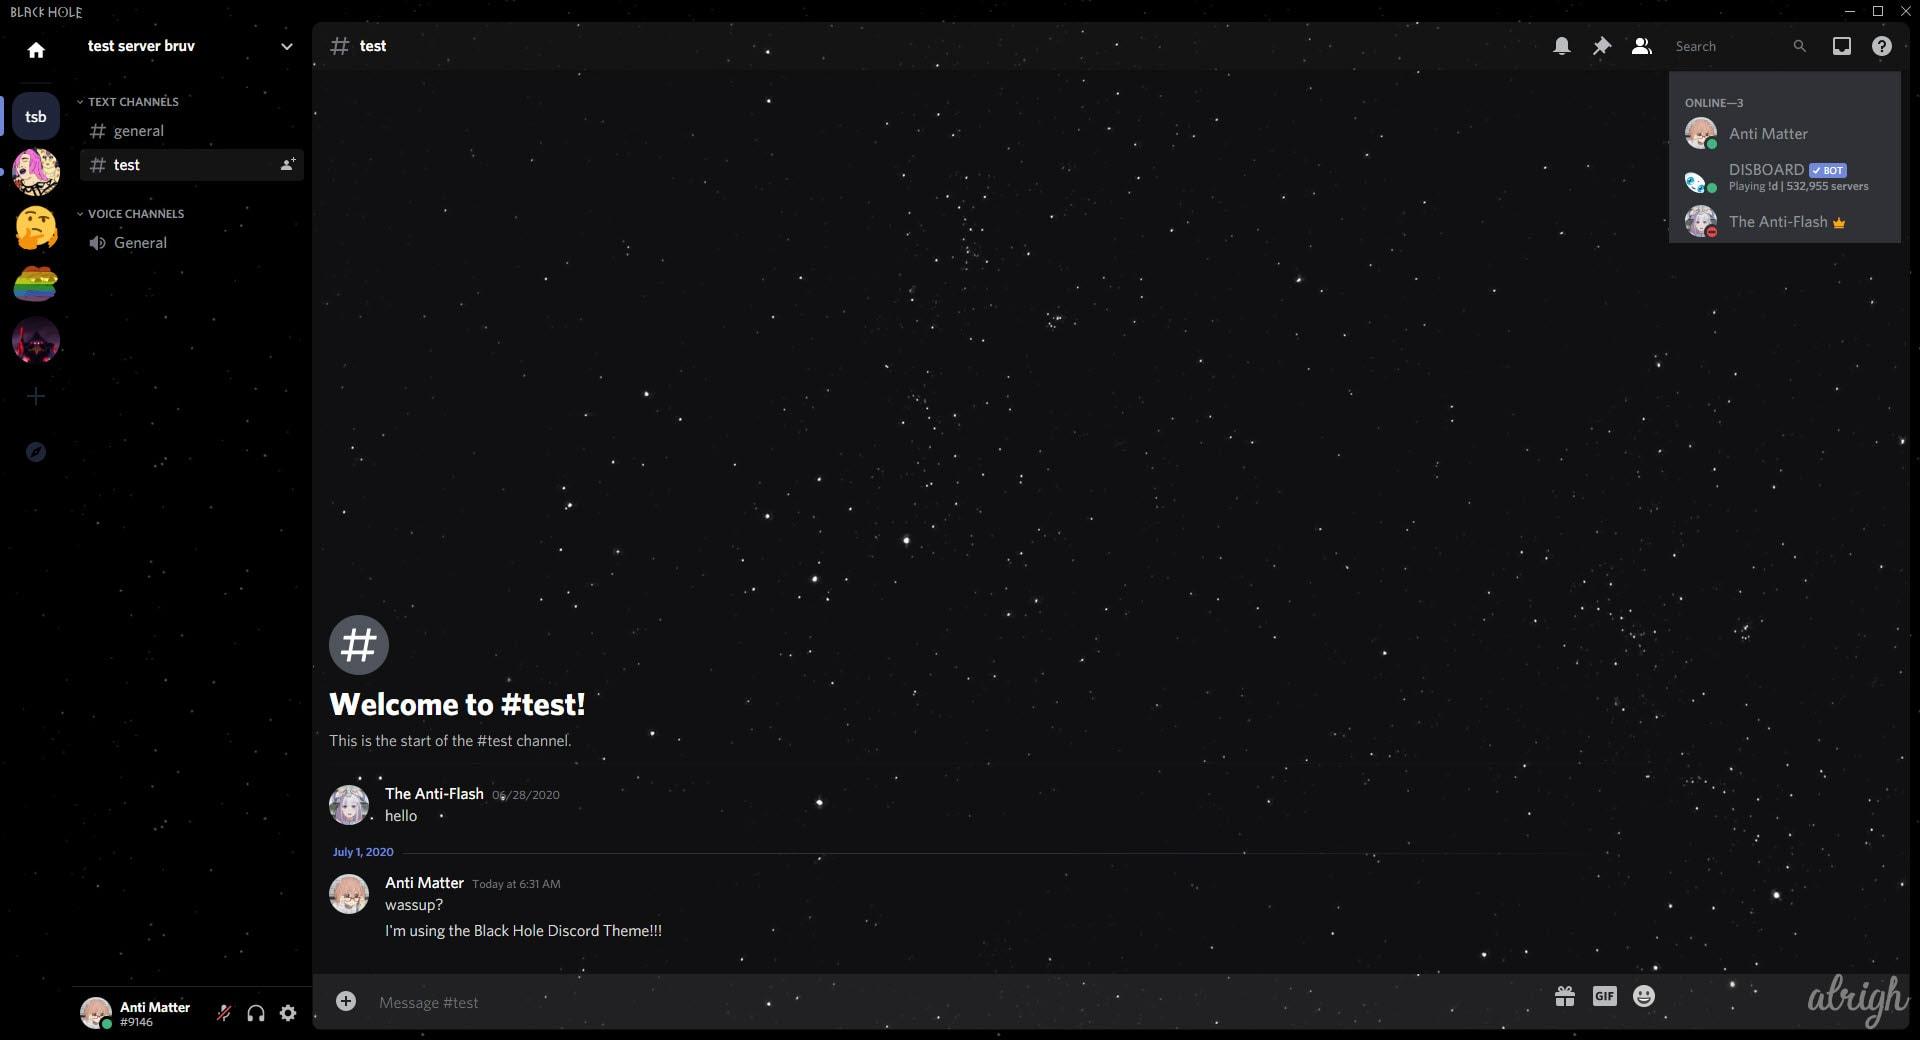 Black Hole Discord Theme